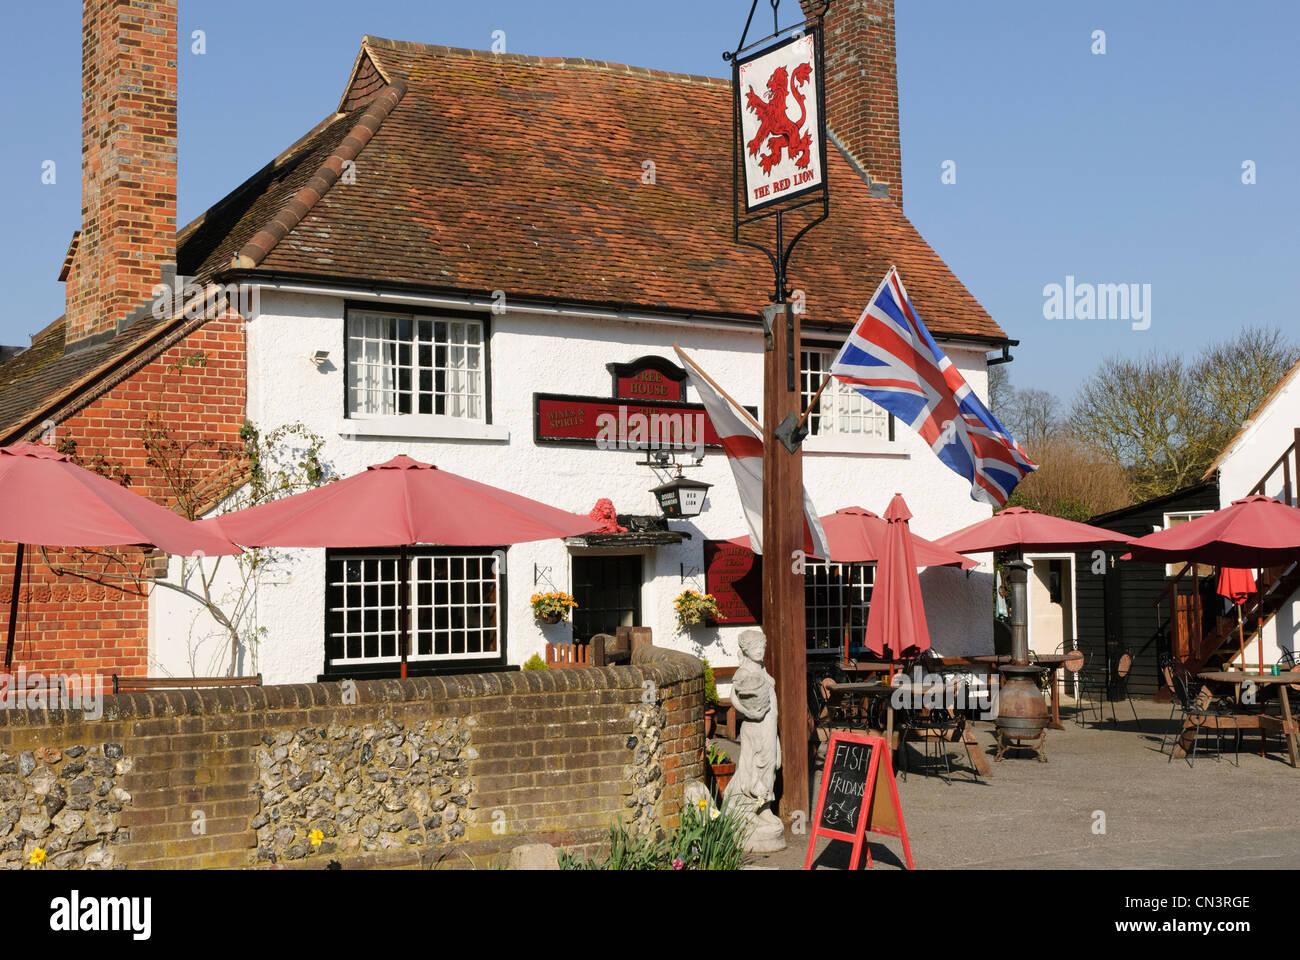 The Red Lion pub in Little Missenden, Buckinghamshire, U.K. - Stock Image